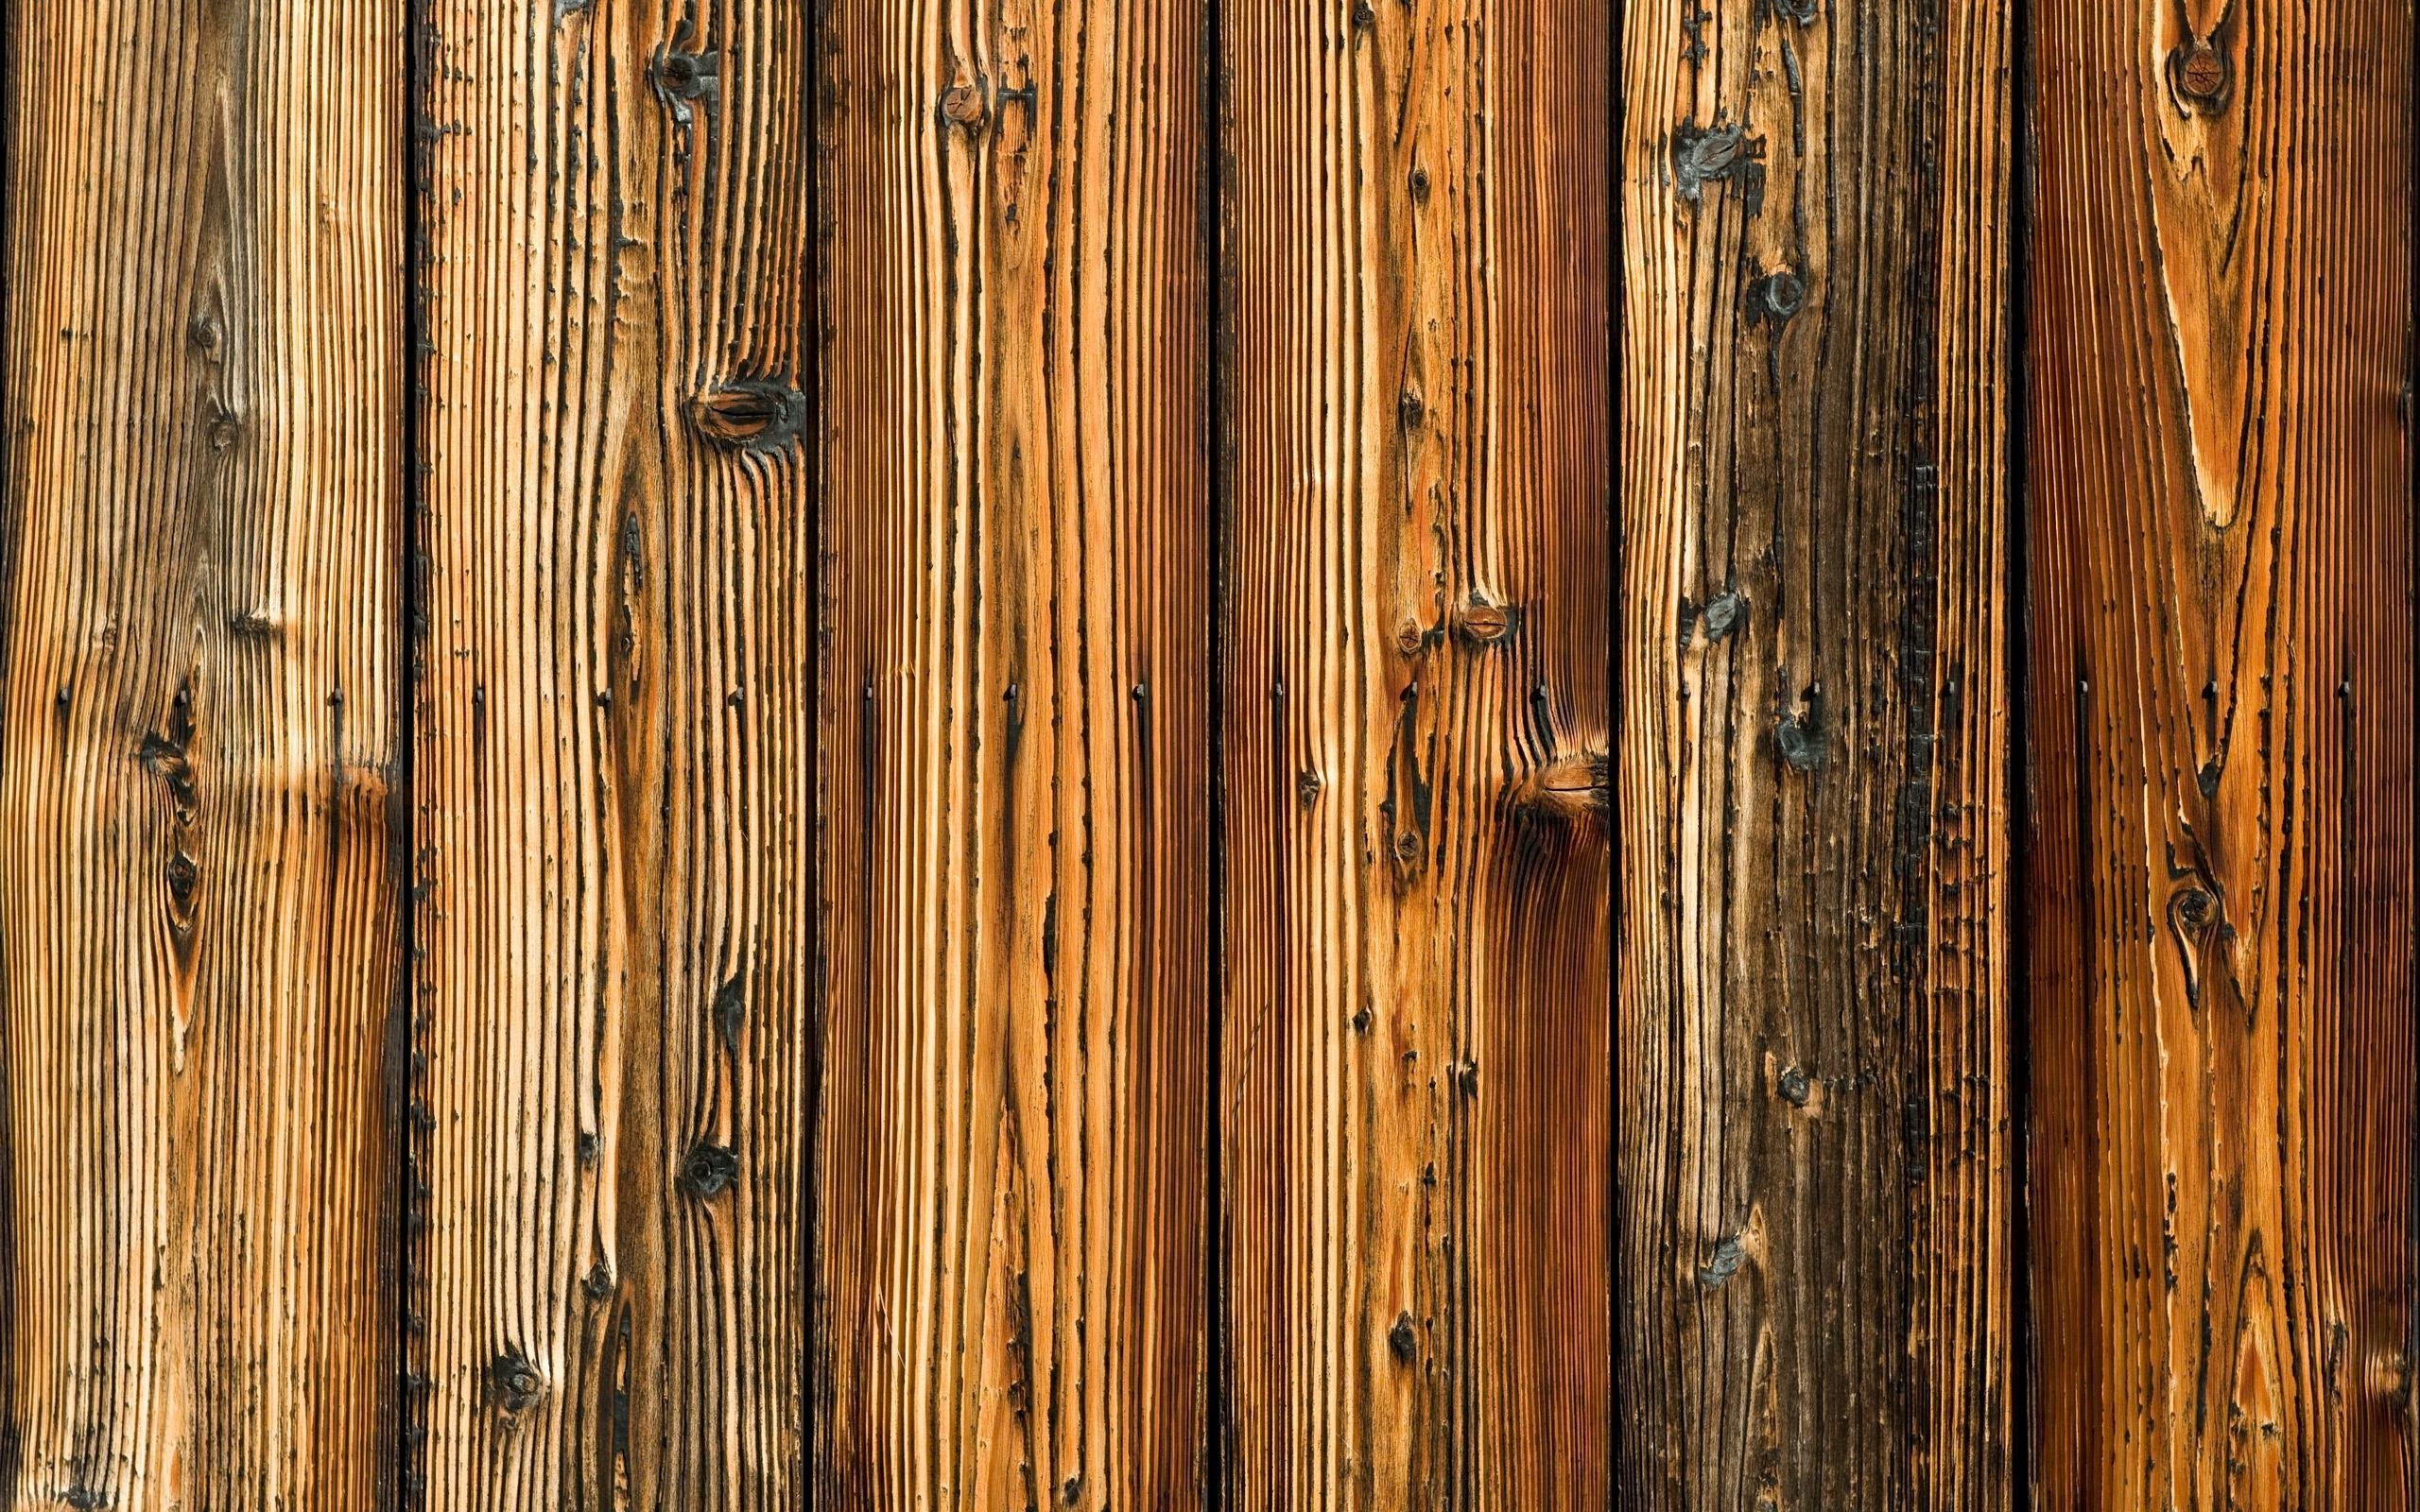 wood design wallpaper photo - 6